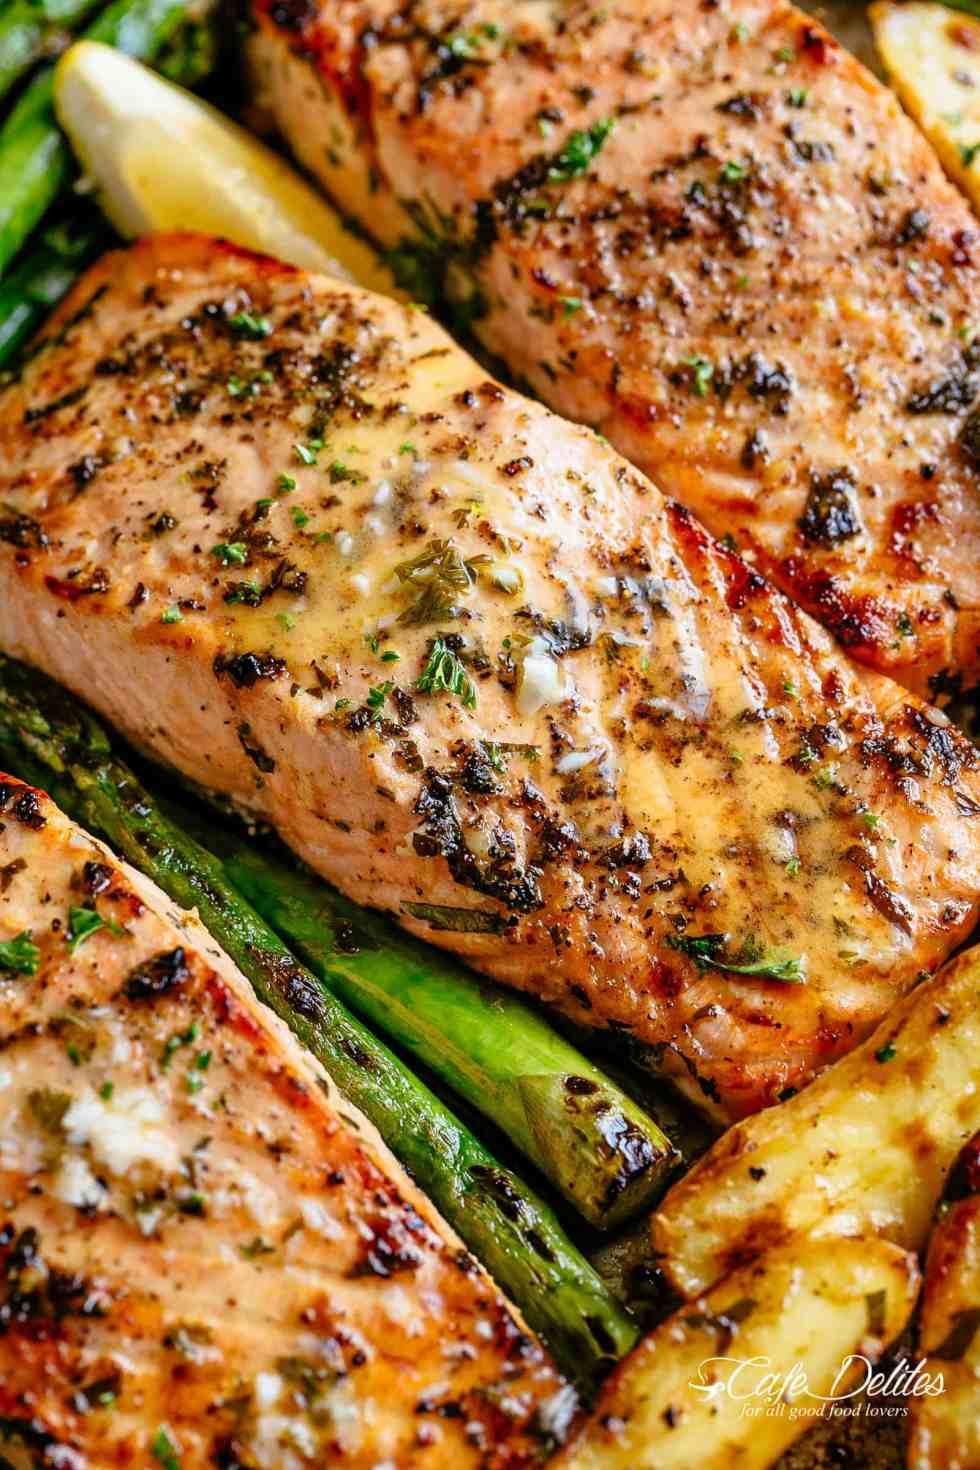 salmon baked butter garlic potatoes pan cook sheet oven asparagus sauce roast crispy